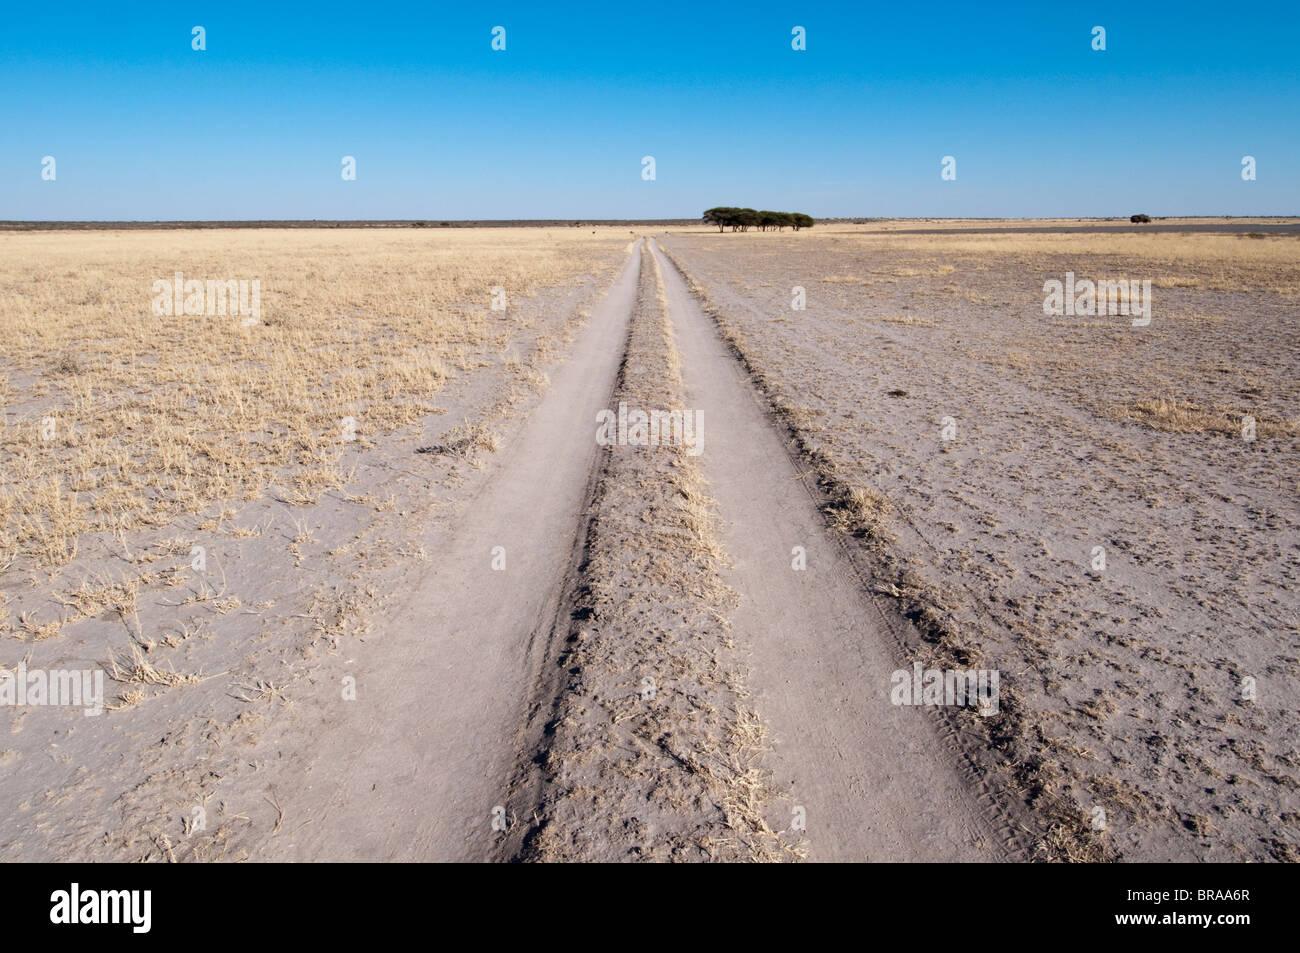 Deception Valley, Central Kalahari Game Reserve, Botswana, Africa - Stock Image